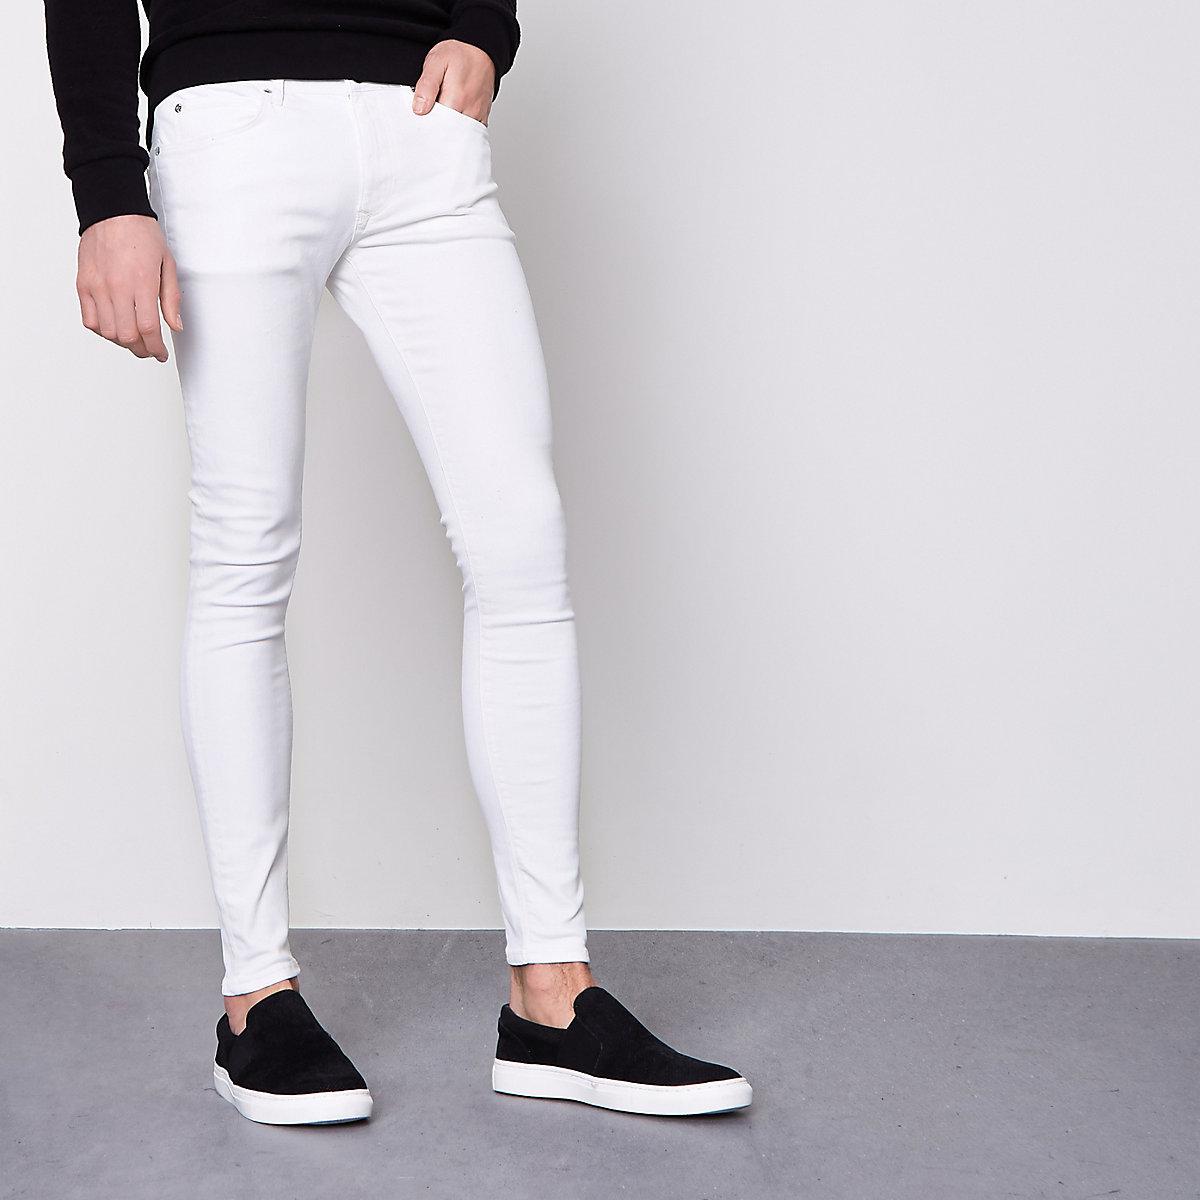 White Ollie super skinny spray on jeans